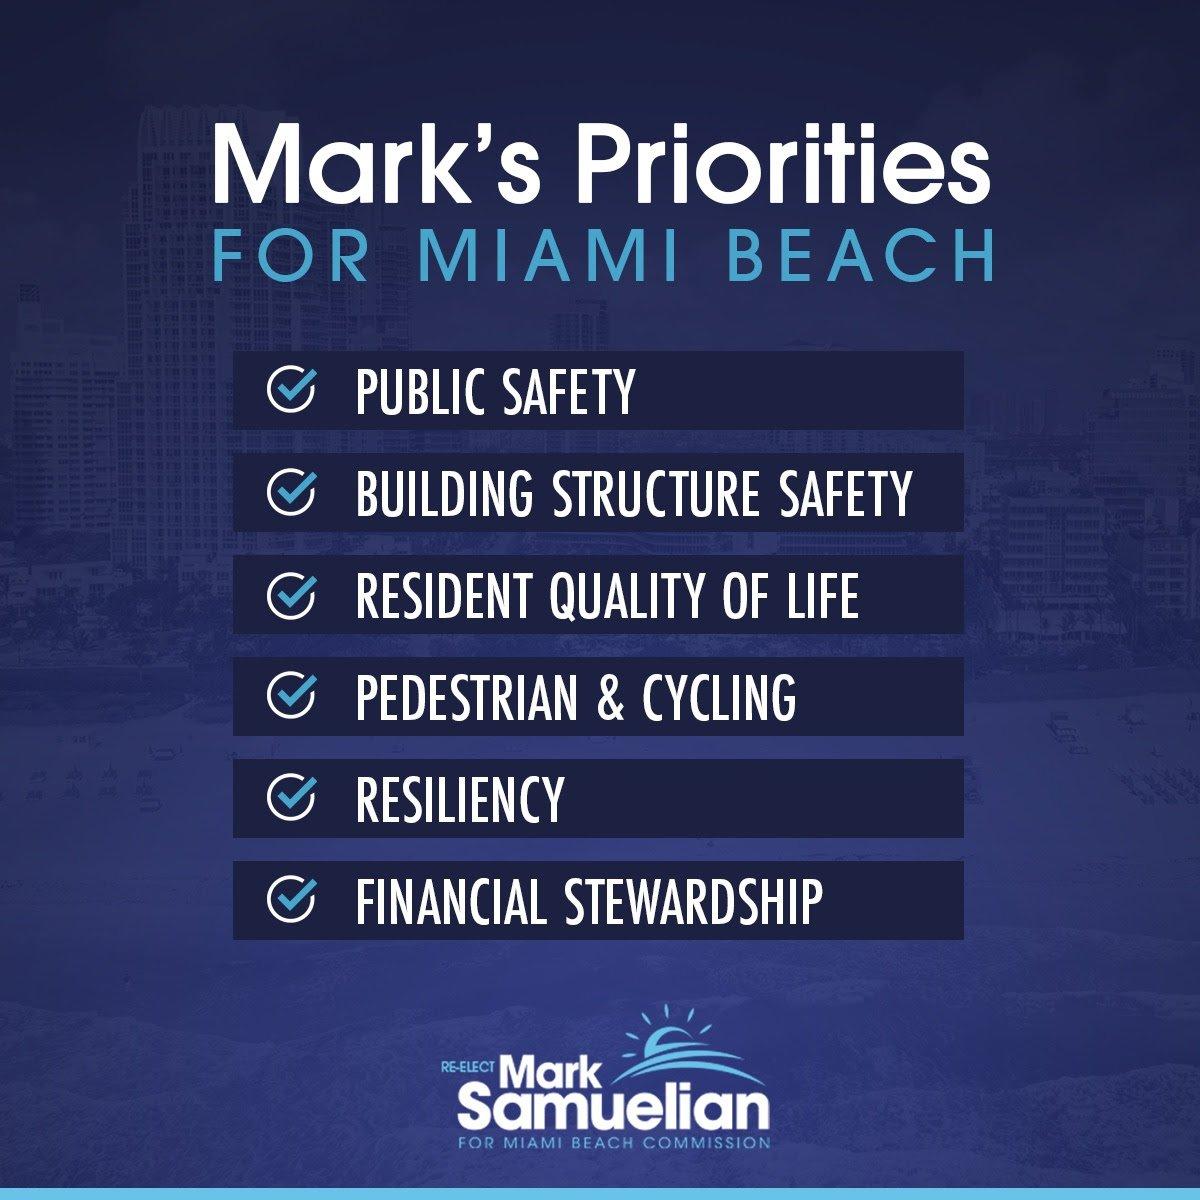 Mark's Priorities